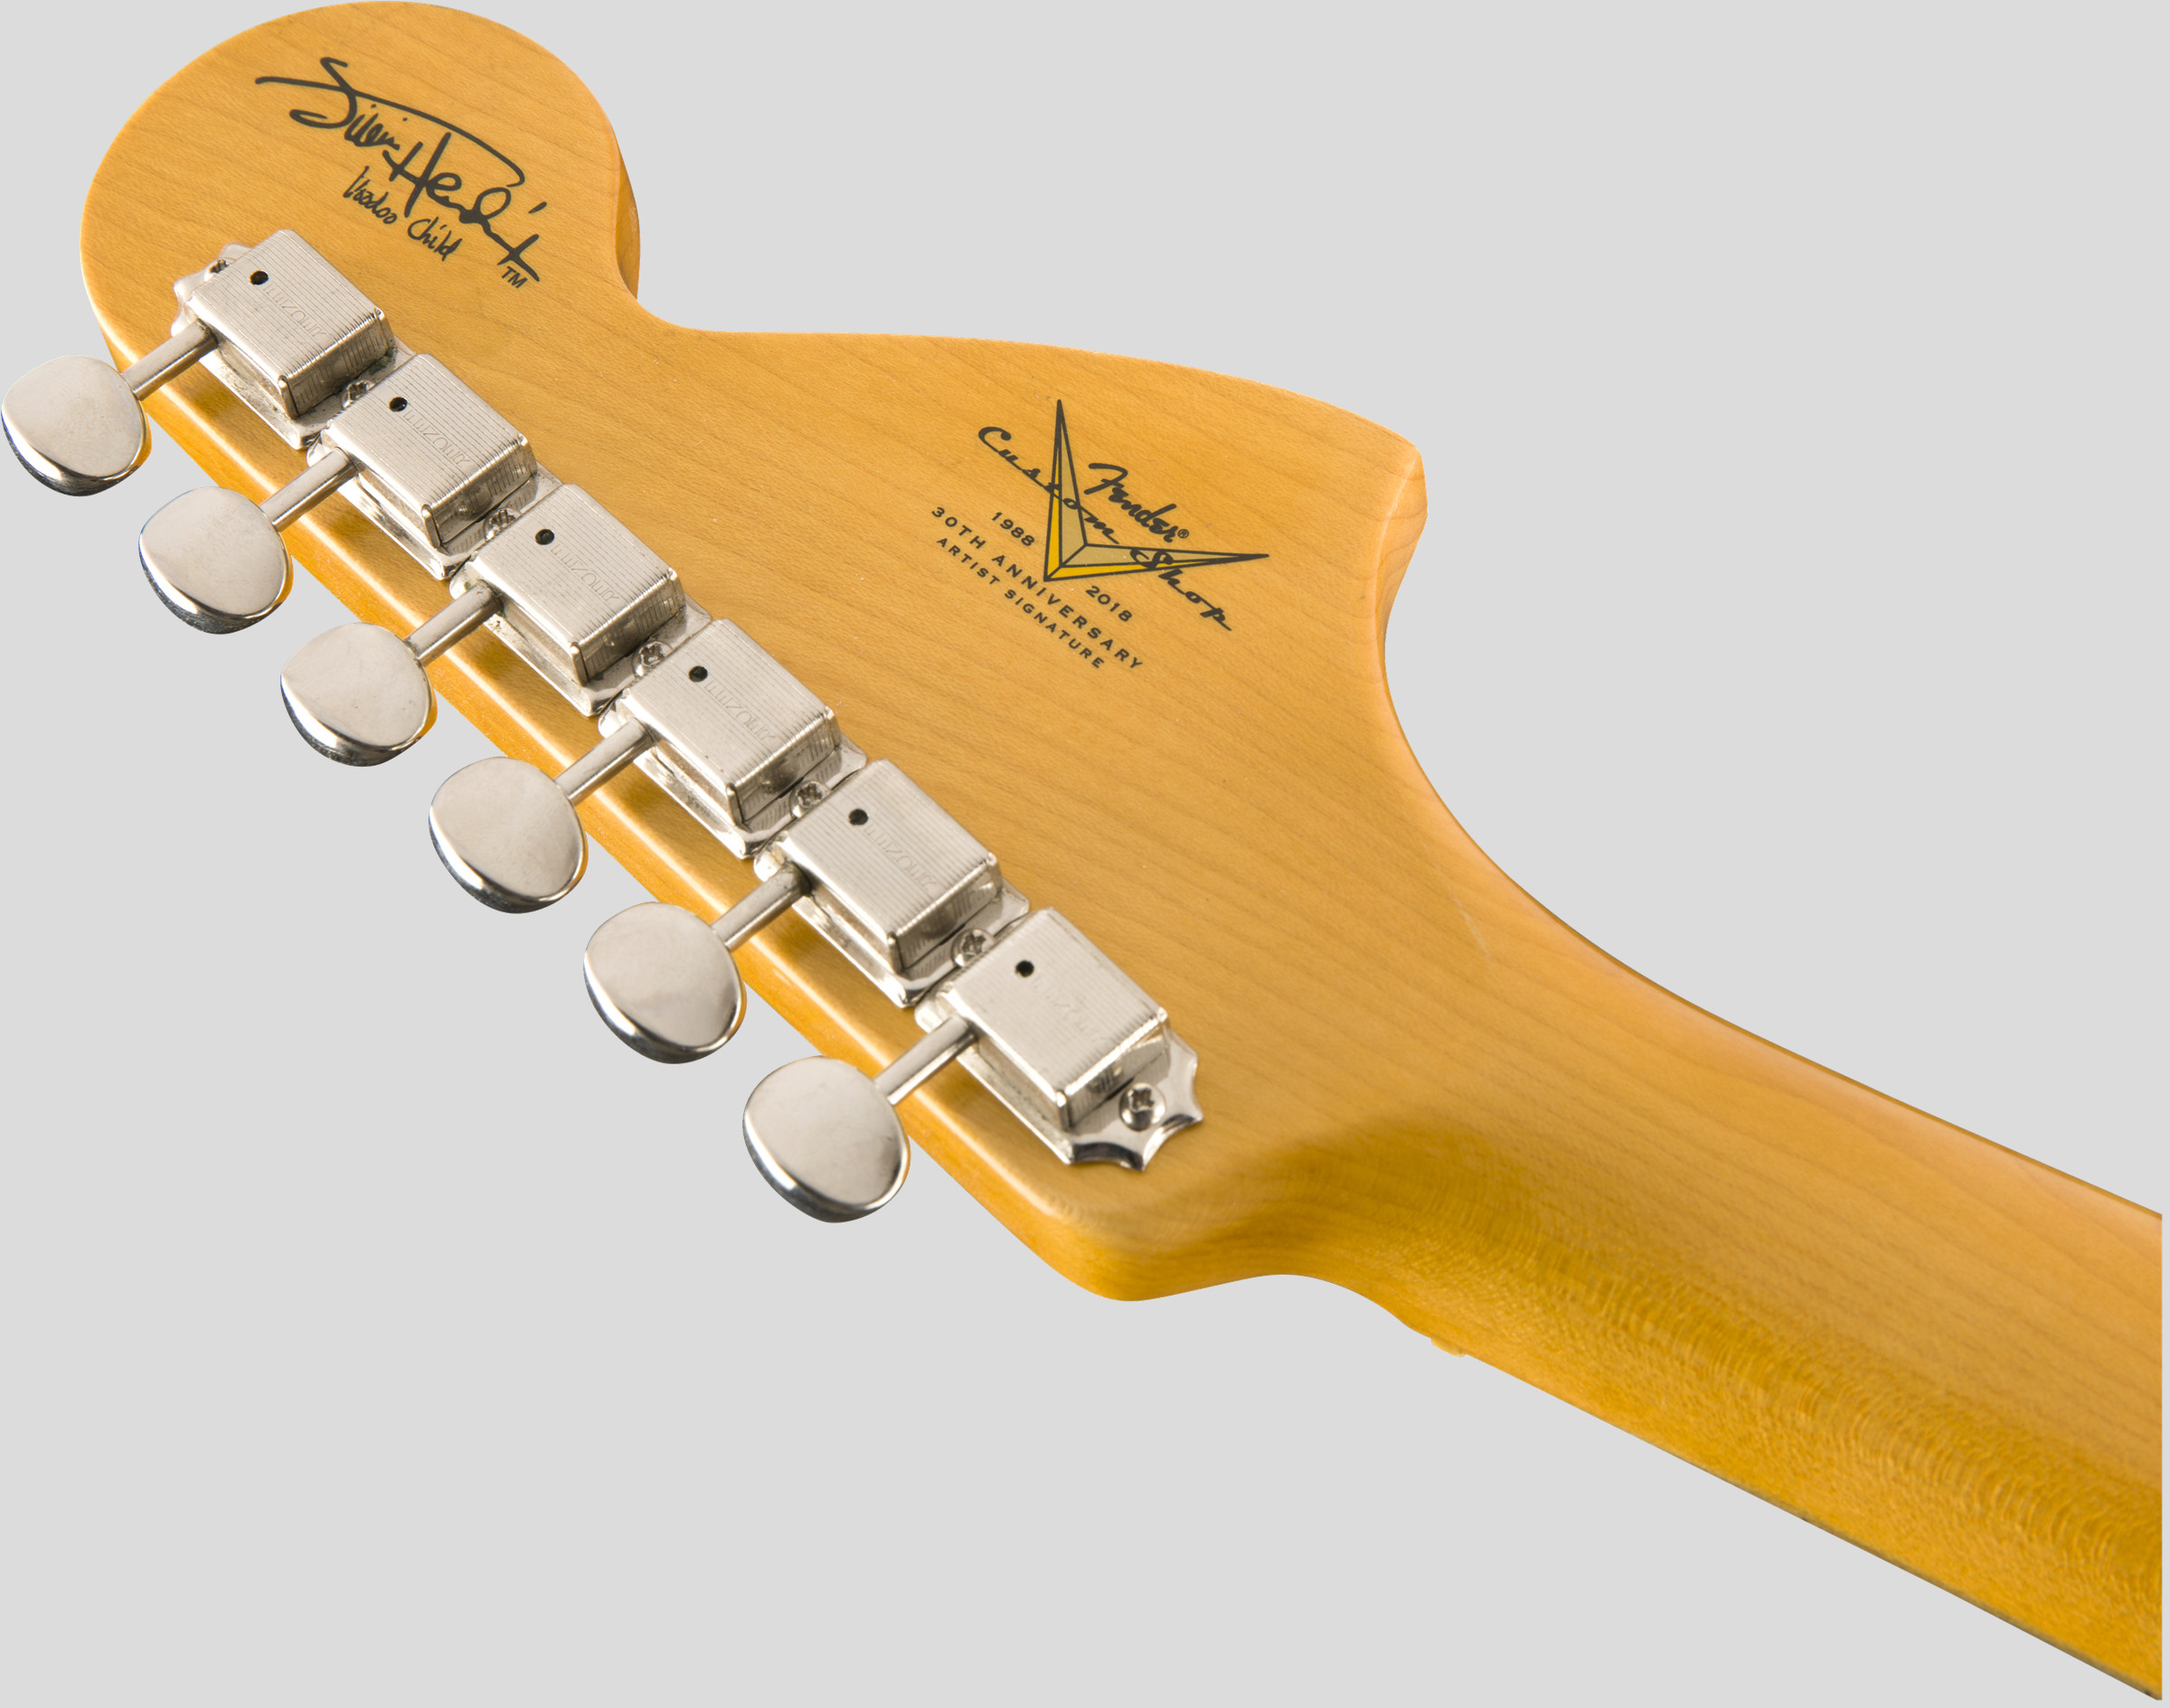 Fender Custom Shop Jimi Hendrix Voodoo Child Stratocaster Black Journeyman Relic 6